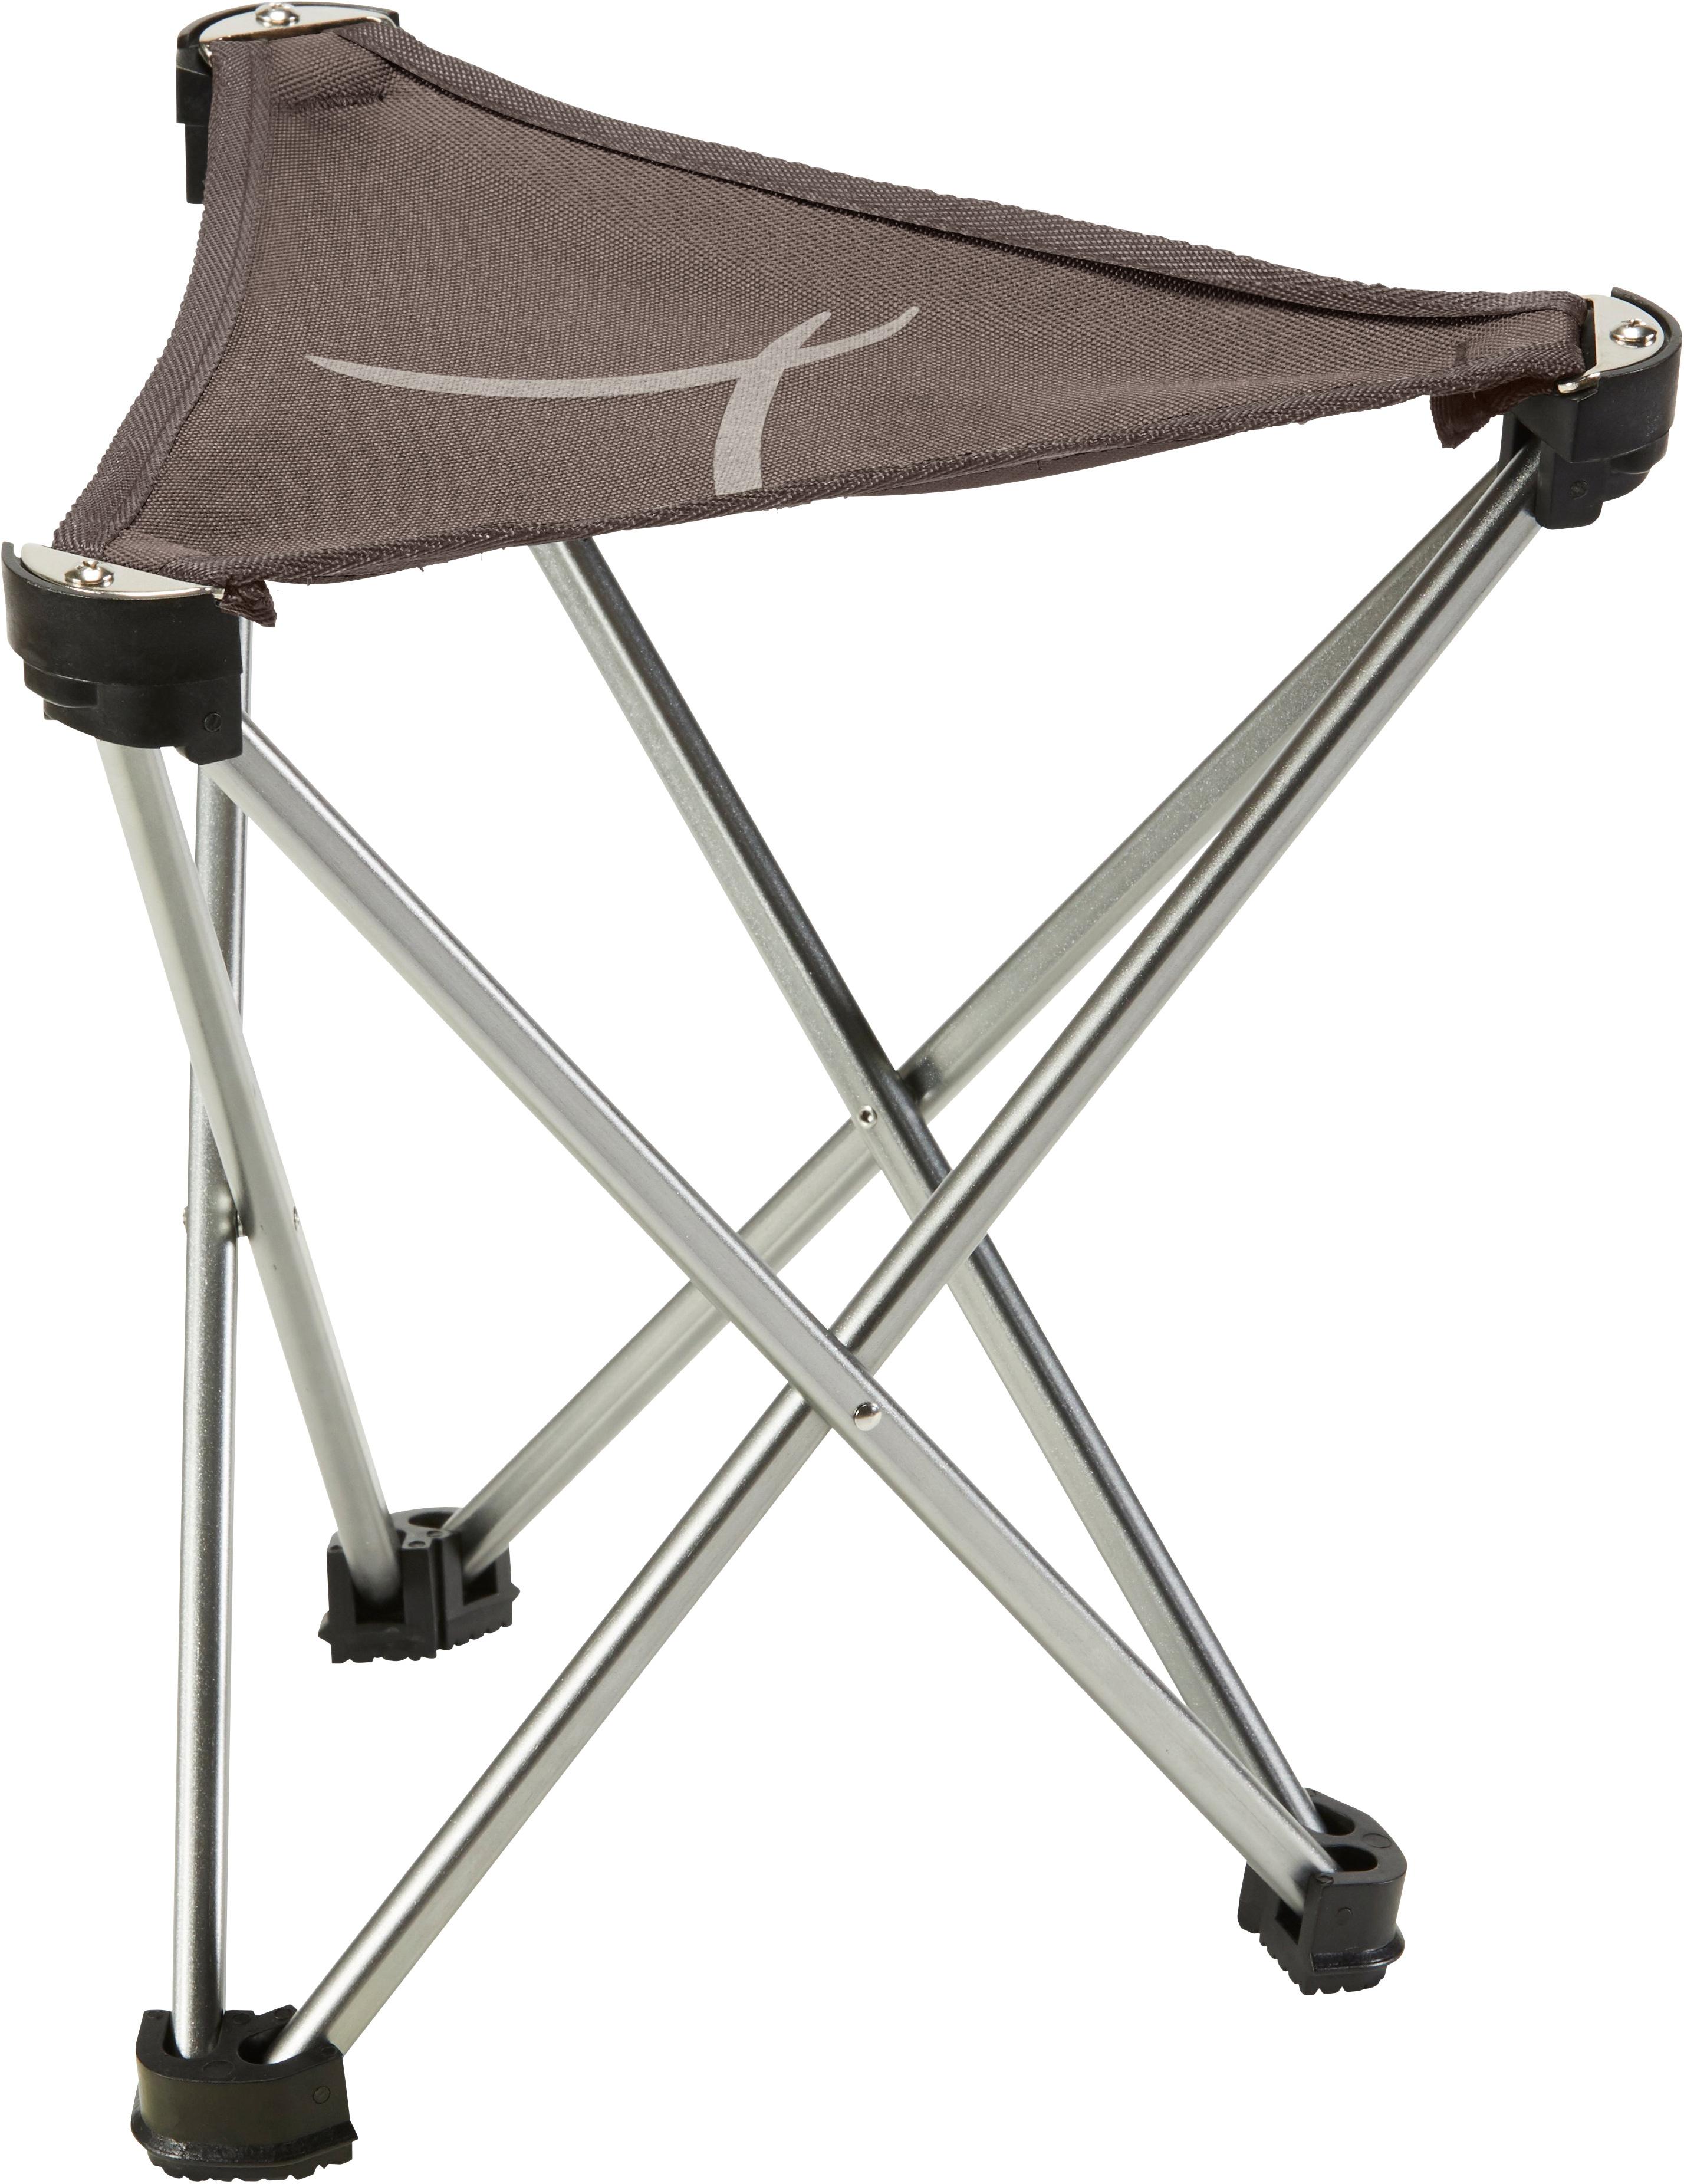 GRAND CANYON Campingstuhl SUPAI MINI grau Campingmöbel Camping Schlafen Outdoor